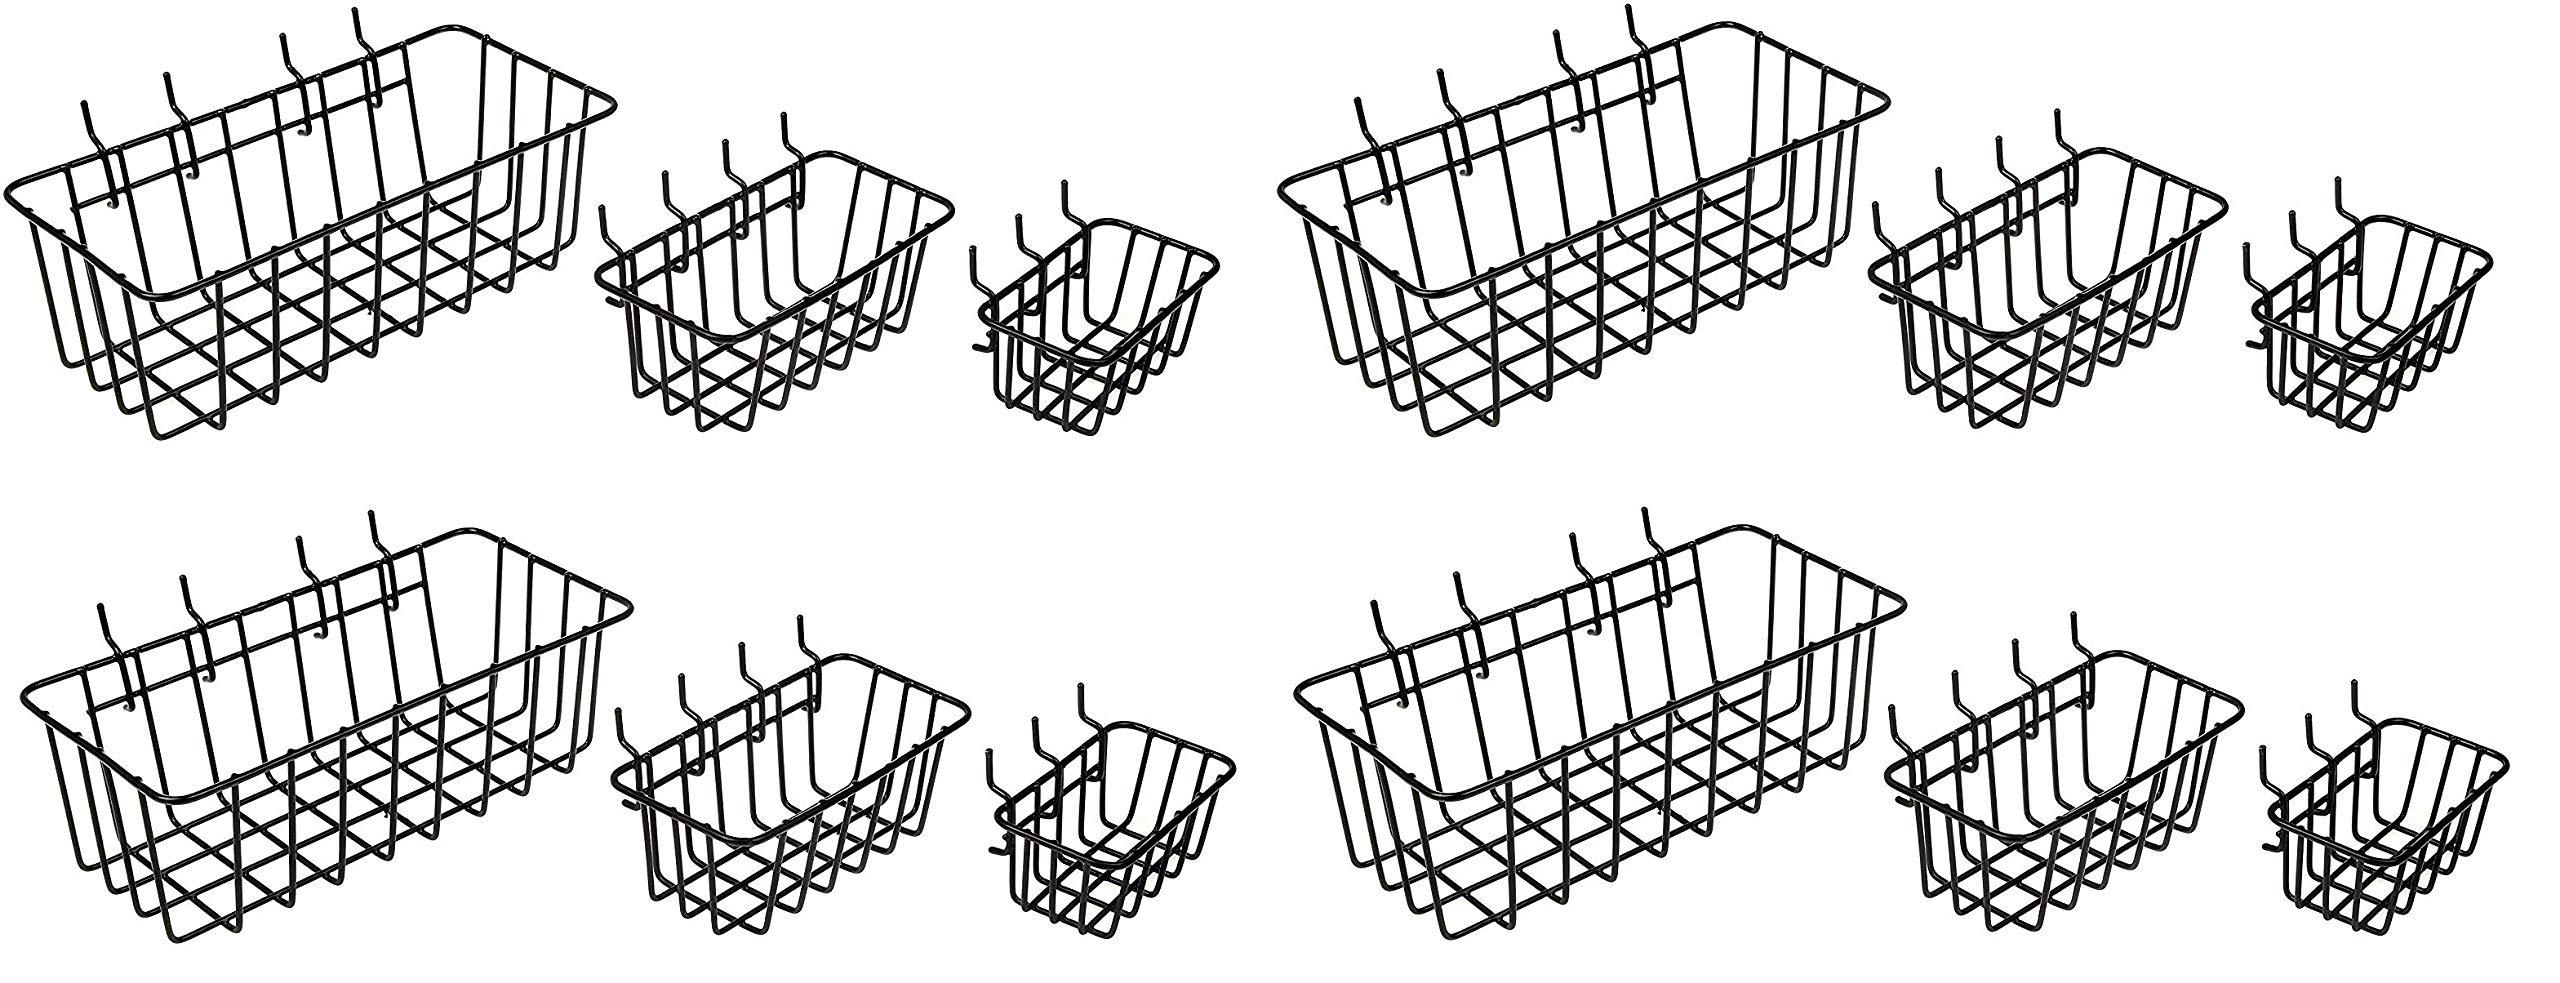 Dorman Hardware 4-9845 Peggable Wire Basket Set (4 X Pack of 3)